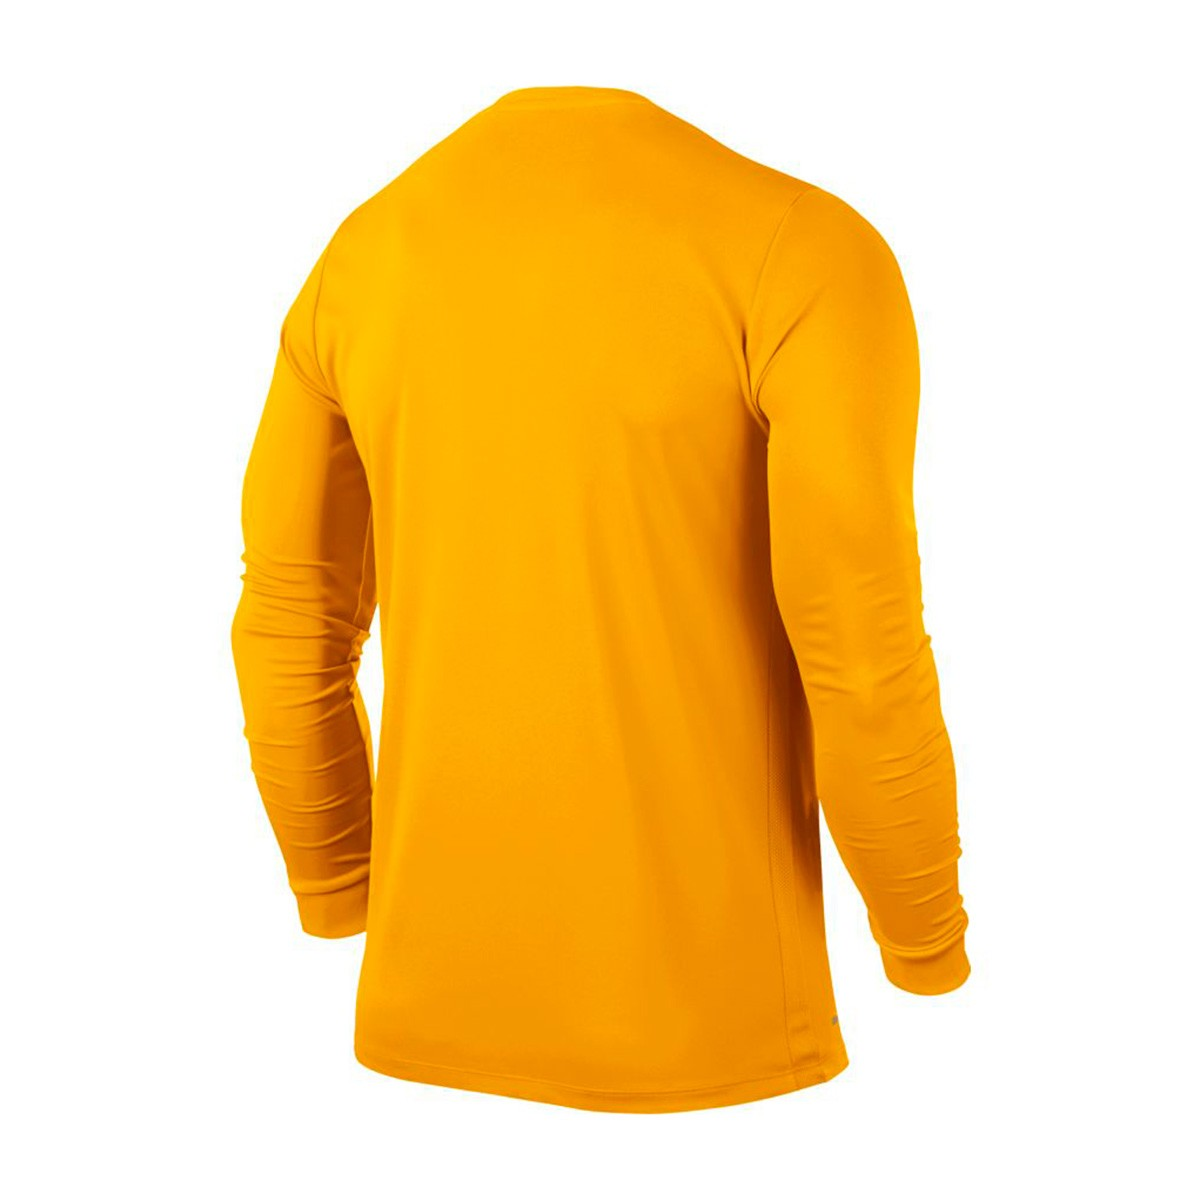 b4188456b4b Jersey Nike Kids Park VI m l University gold-Black - Football store Fútbol  Emotion